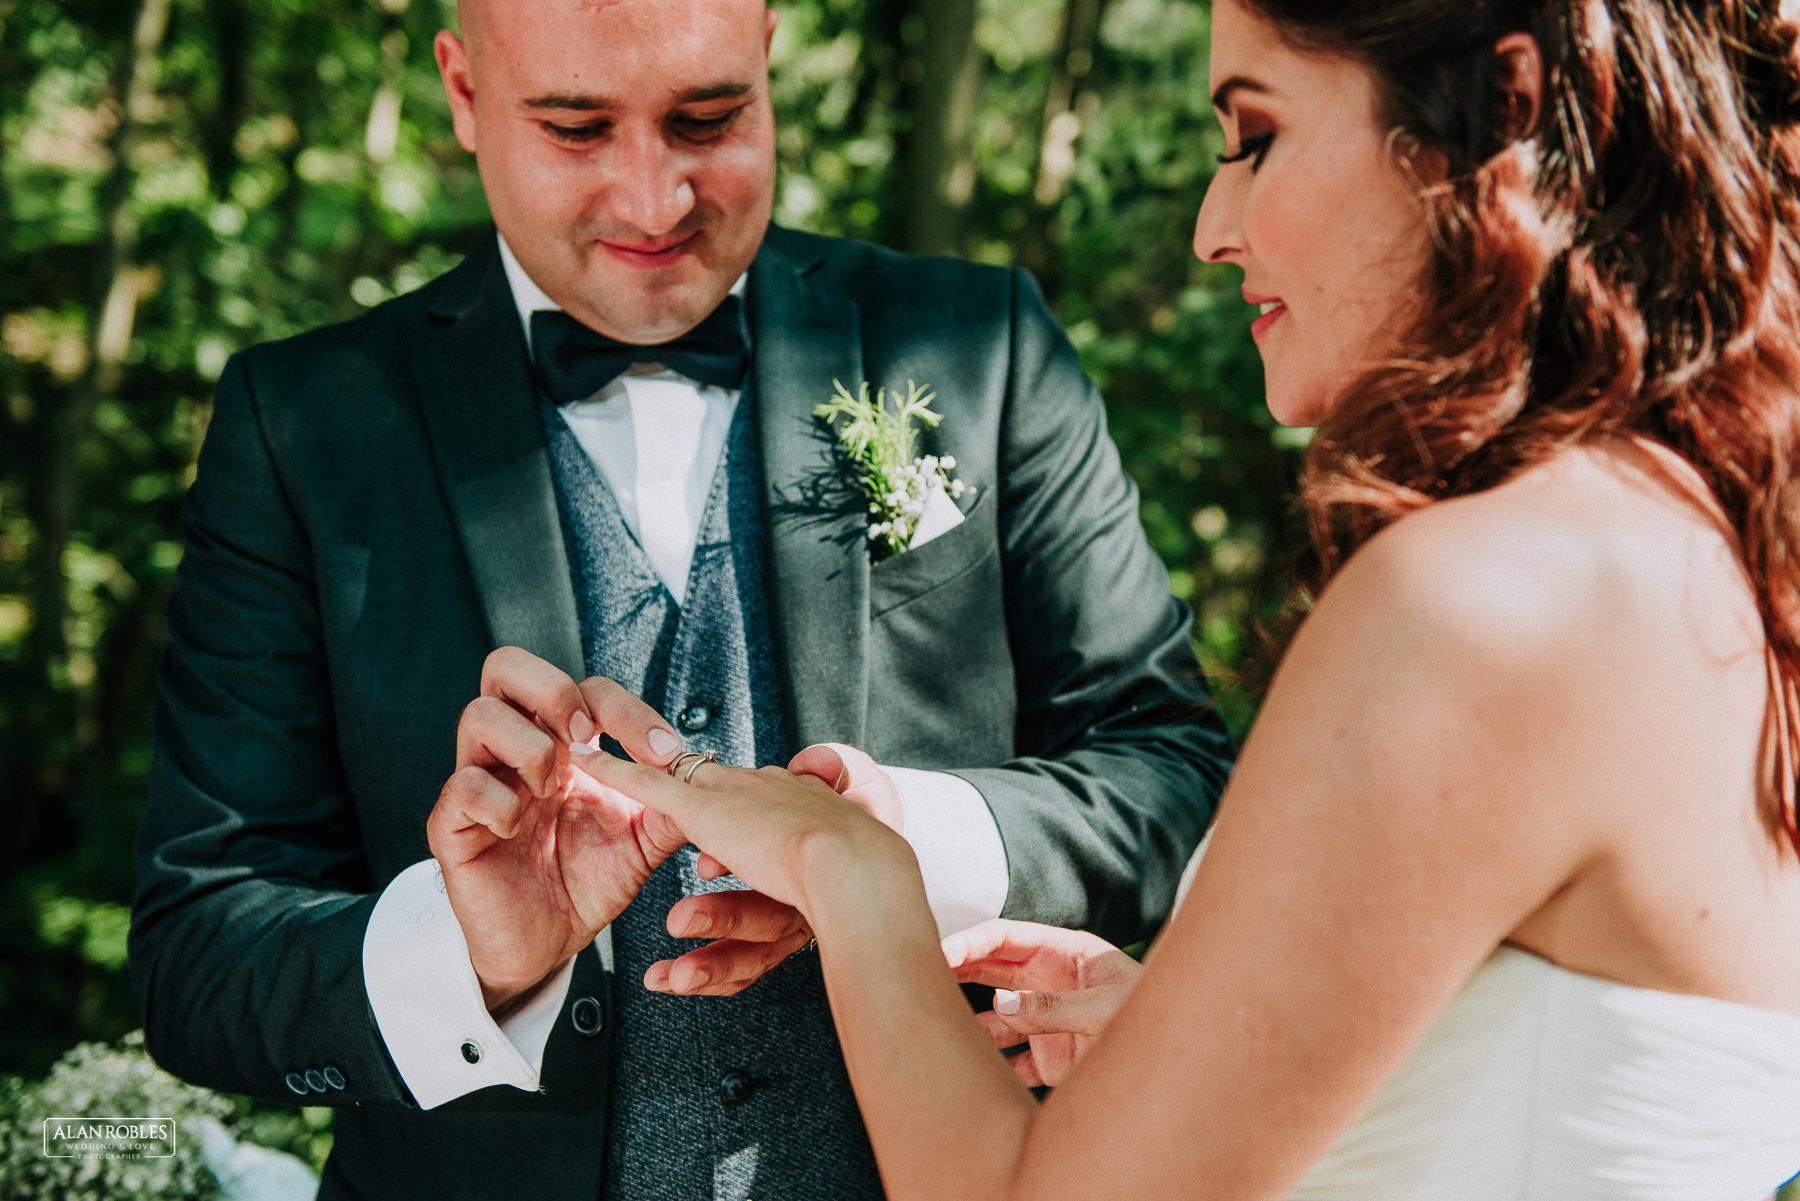 Fotografo de bodas guadalajara Alan Robles - Pinare terraza bistro 40